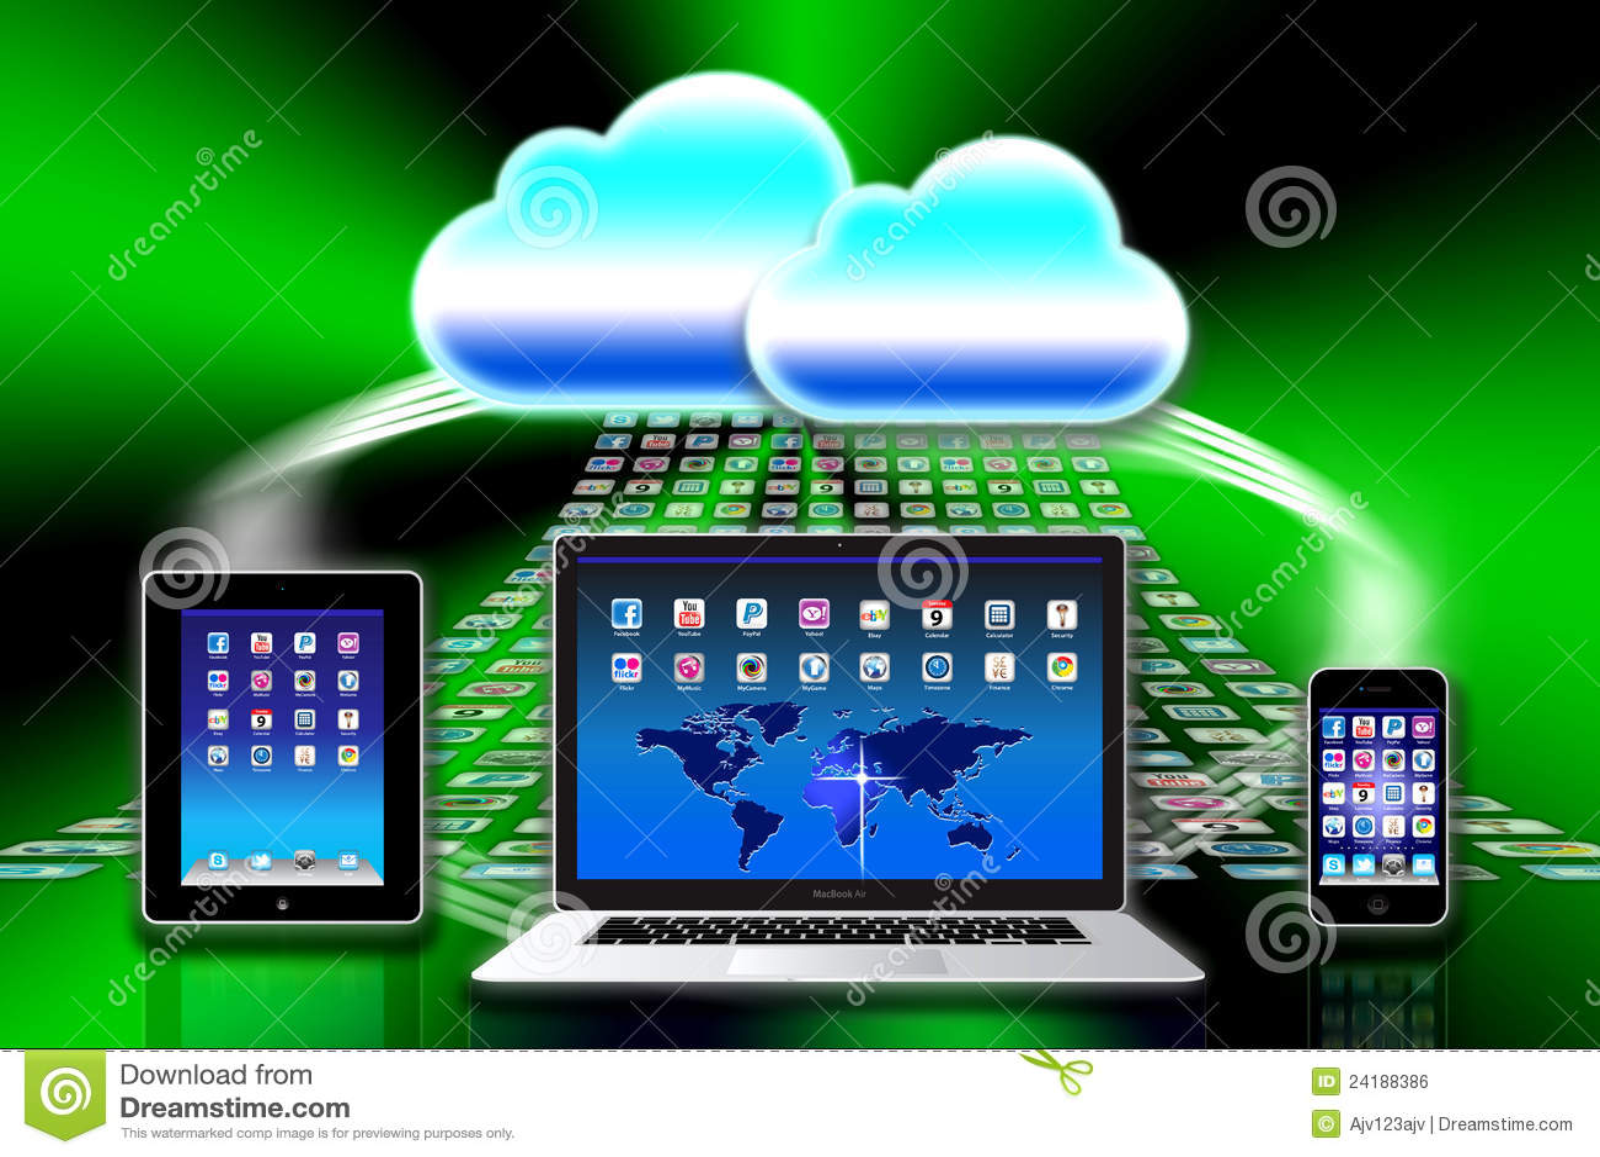 Apple Mac iCloud data apps